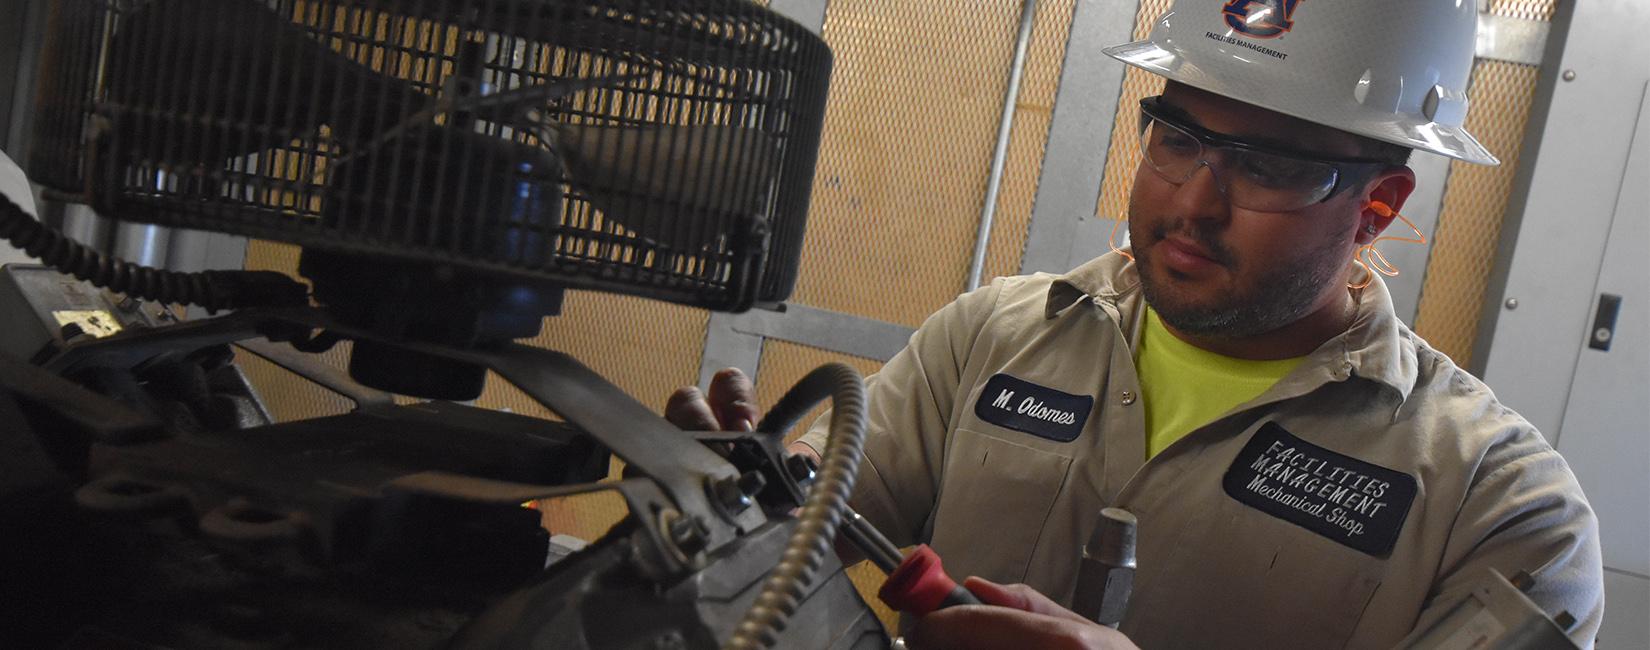 Worker at Auburn University working on equipment.